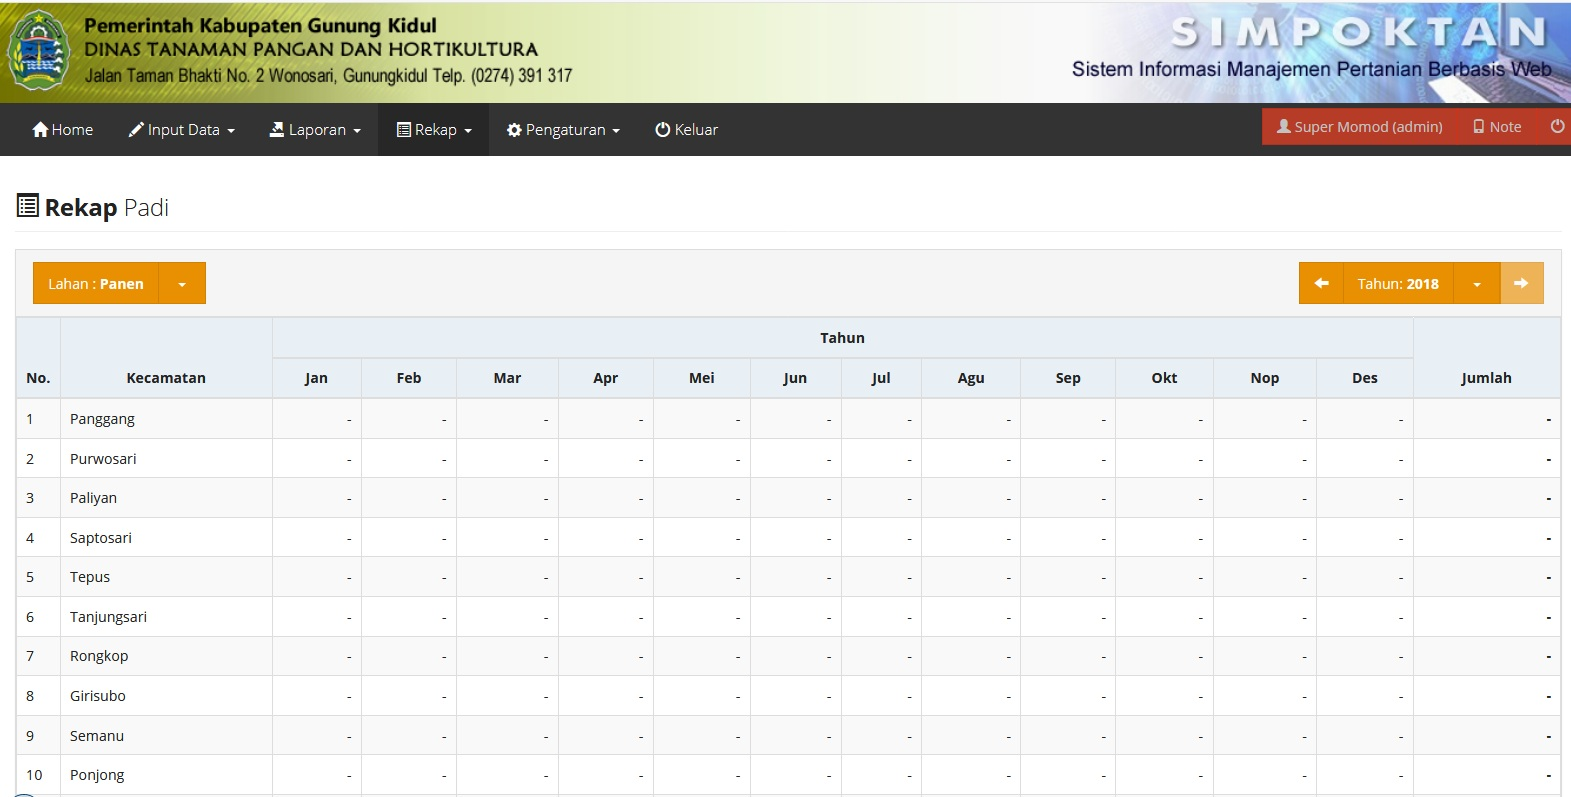 Sistem Informasi Pertanian (SIMPOKTAN) Technophoria Indonesia